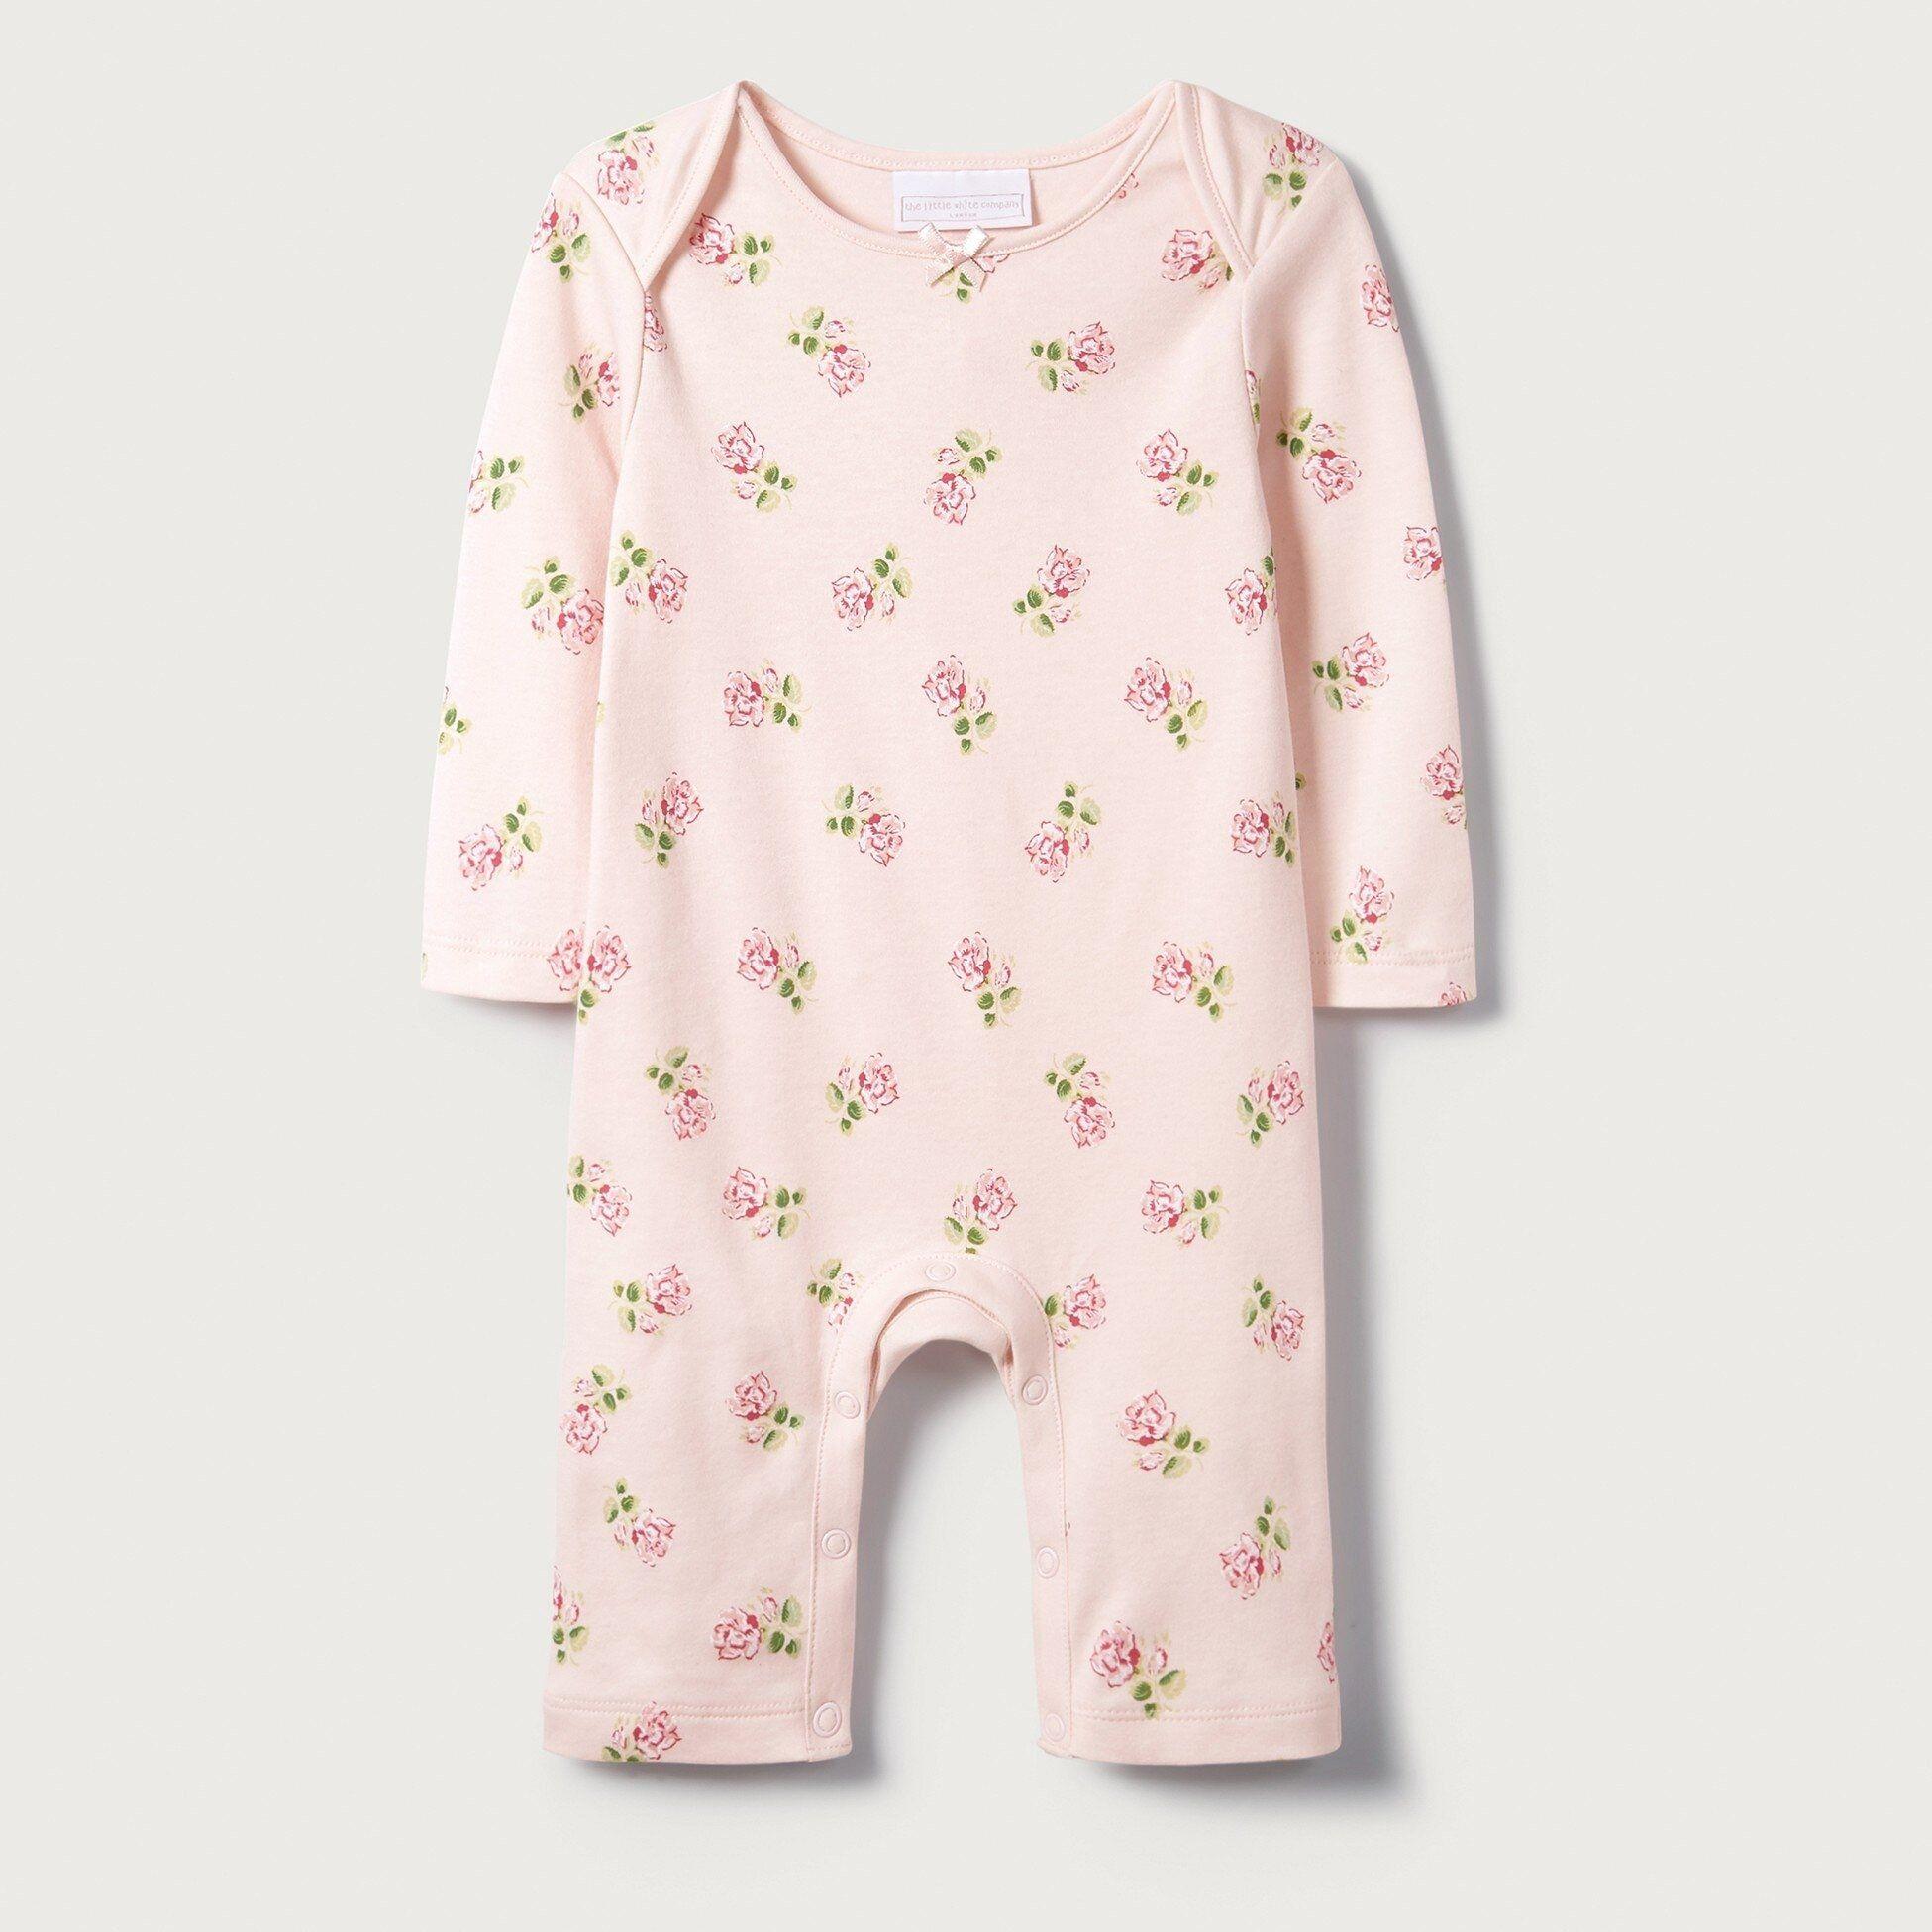 fe7fac09db45c Baby | Newborns, Girls & Boys | The Little White Company UK